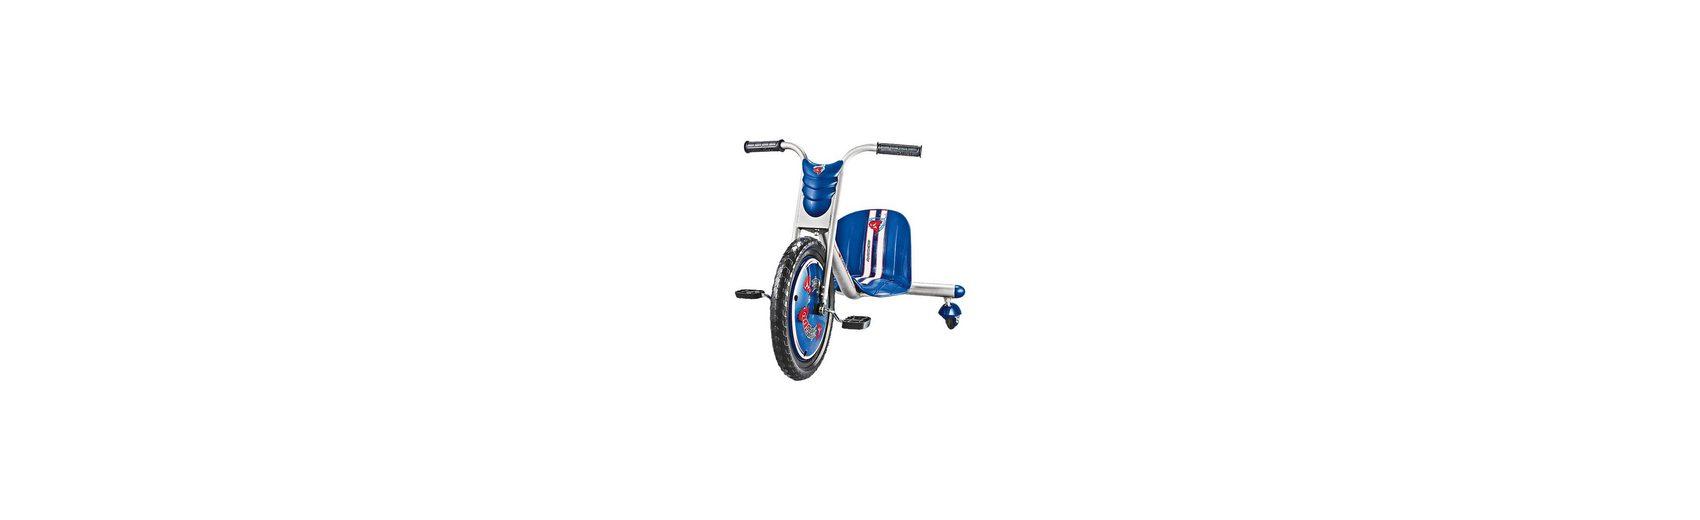 Razor Trike Rip Rider 360